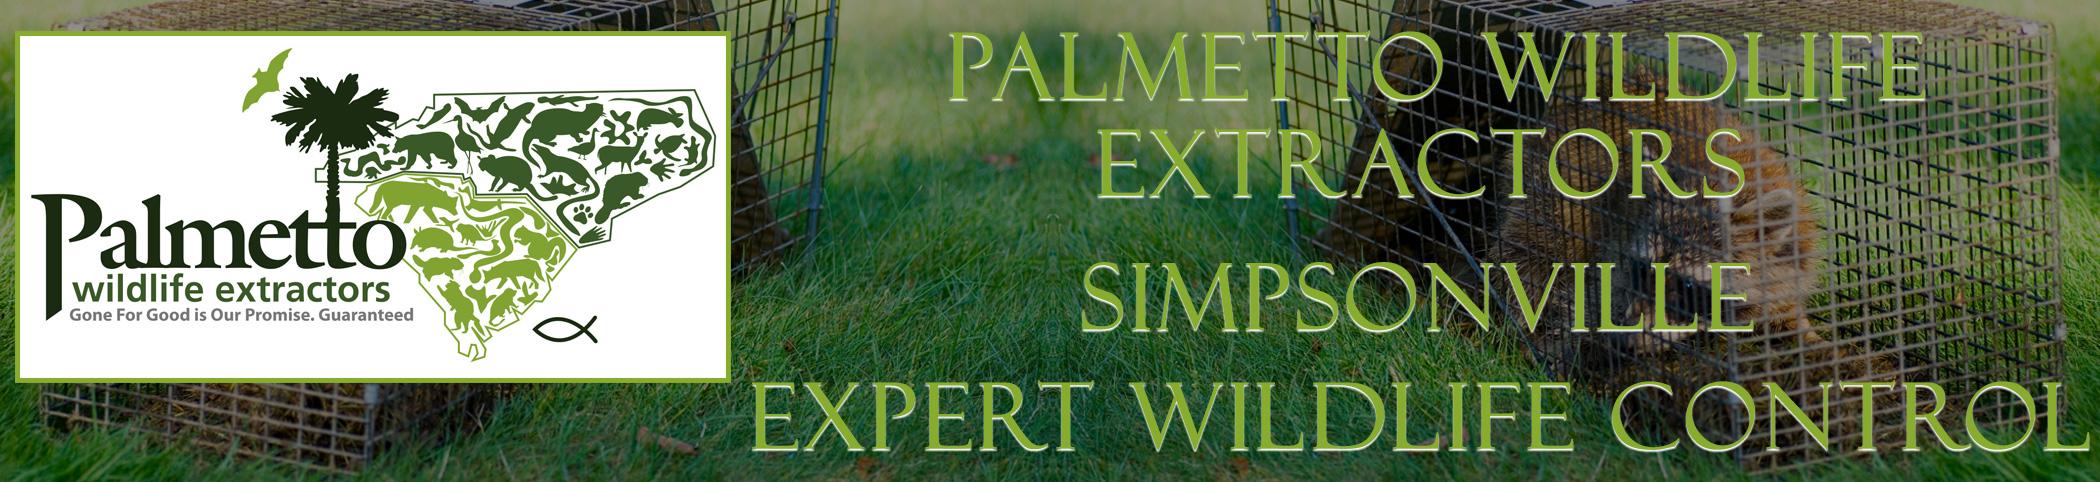 Palmetto Wildlife Extractors Simpsonville South Carolina header image